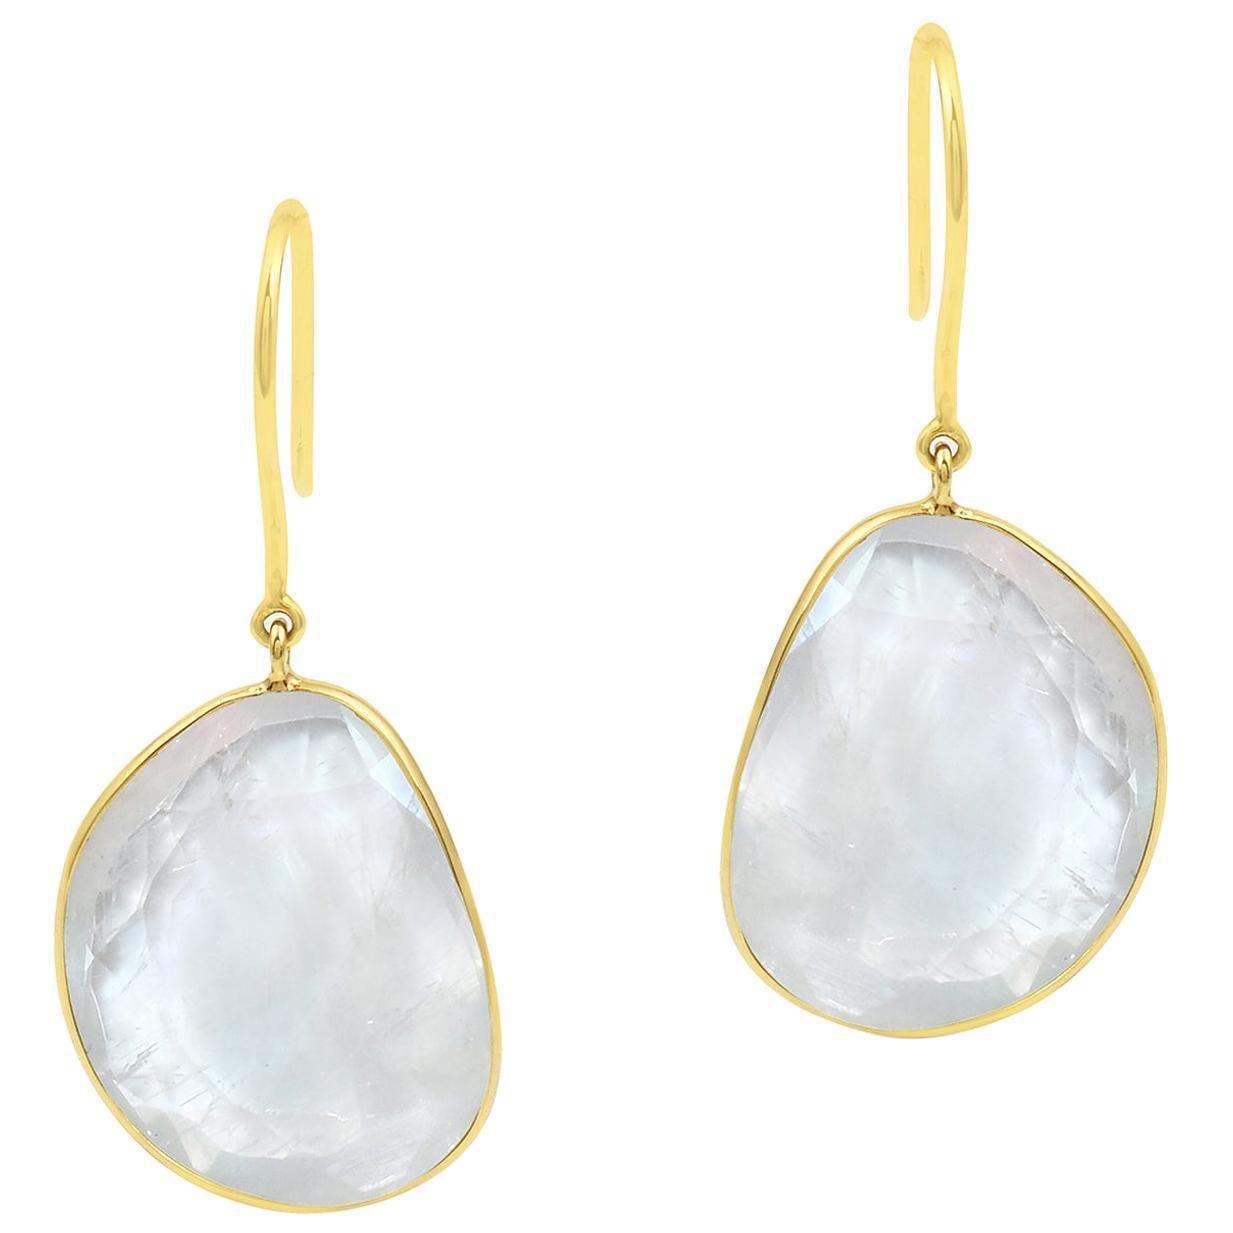 White Rainbow Moonstone Earrings, 18K Yellow Gold